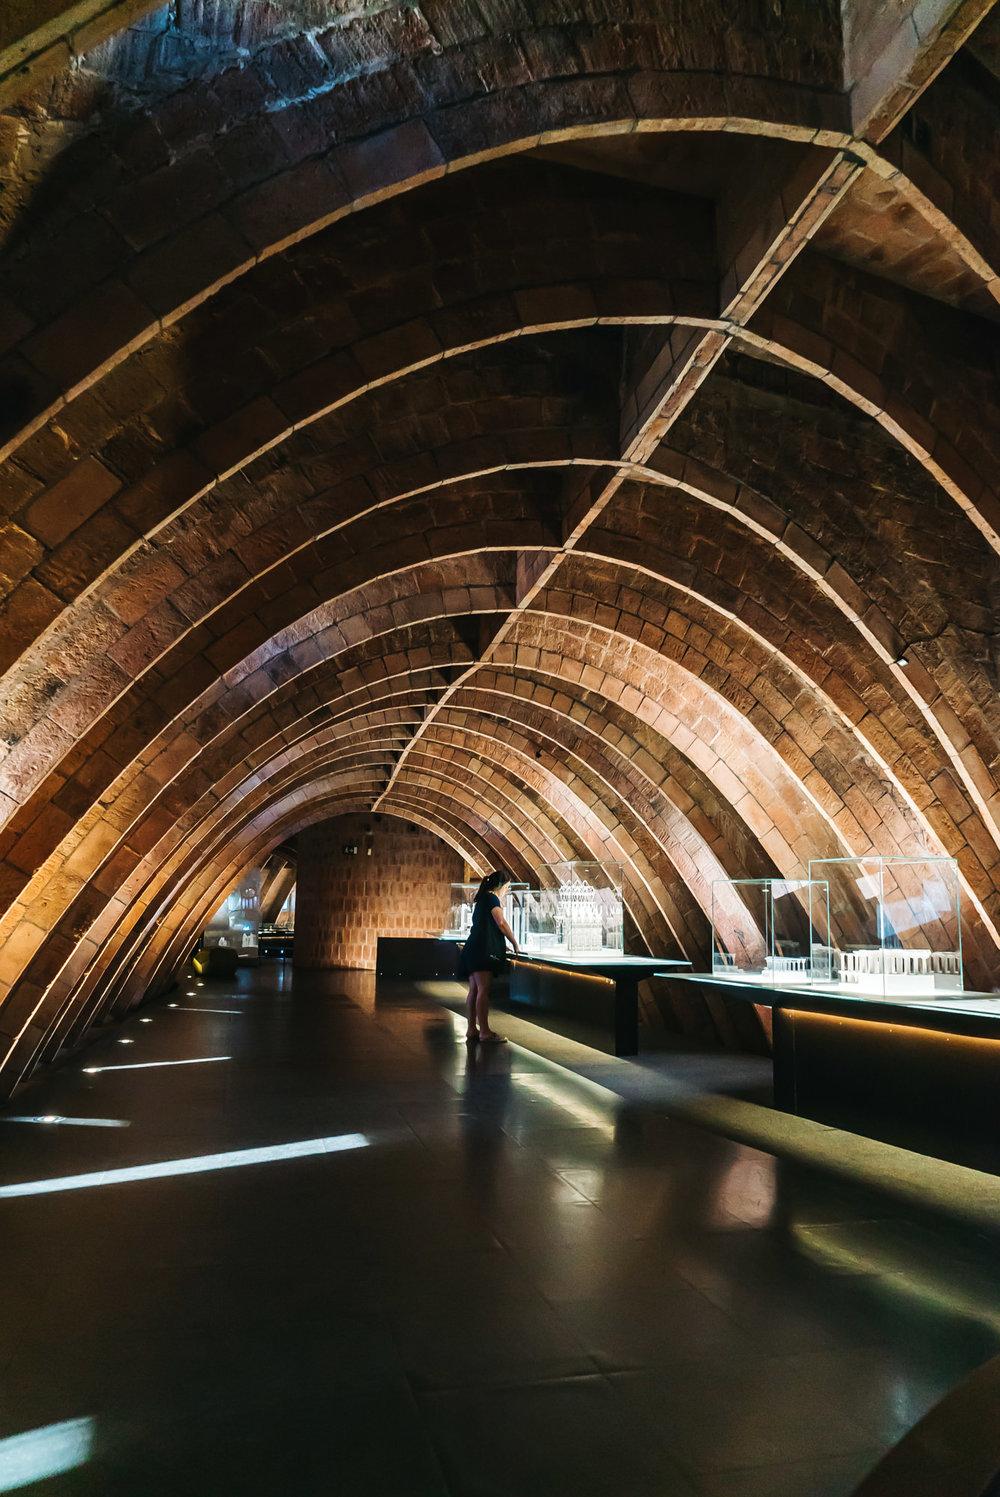 270 catenary arches made of thin brick